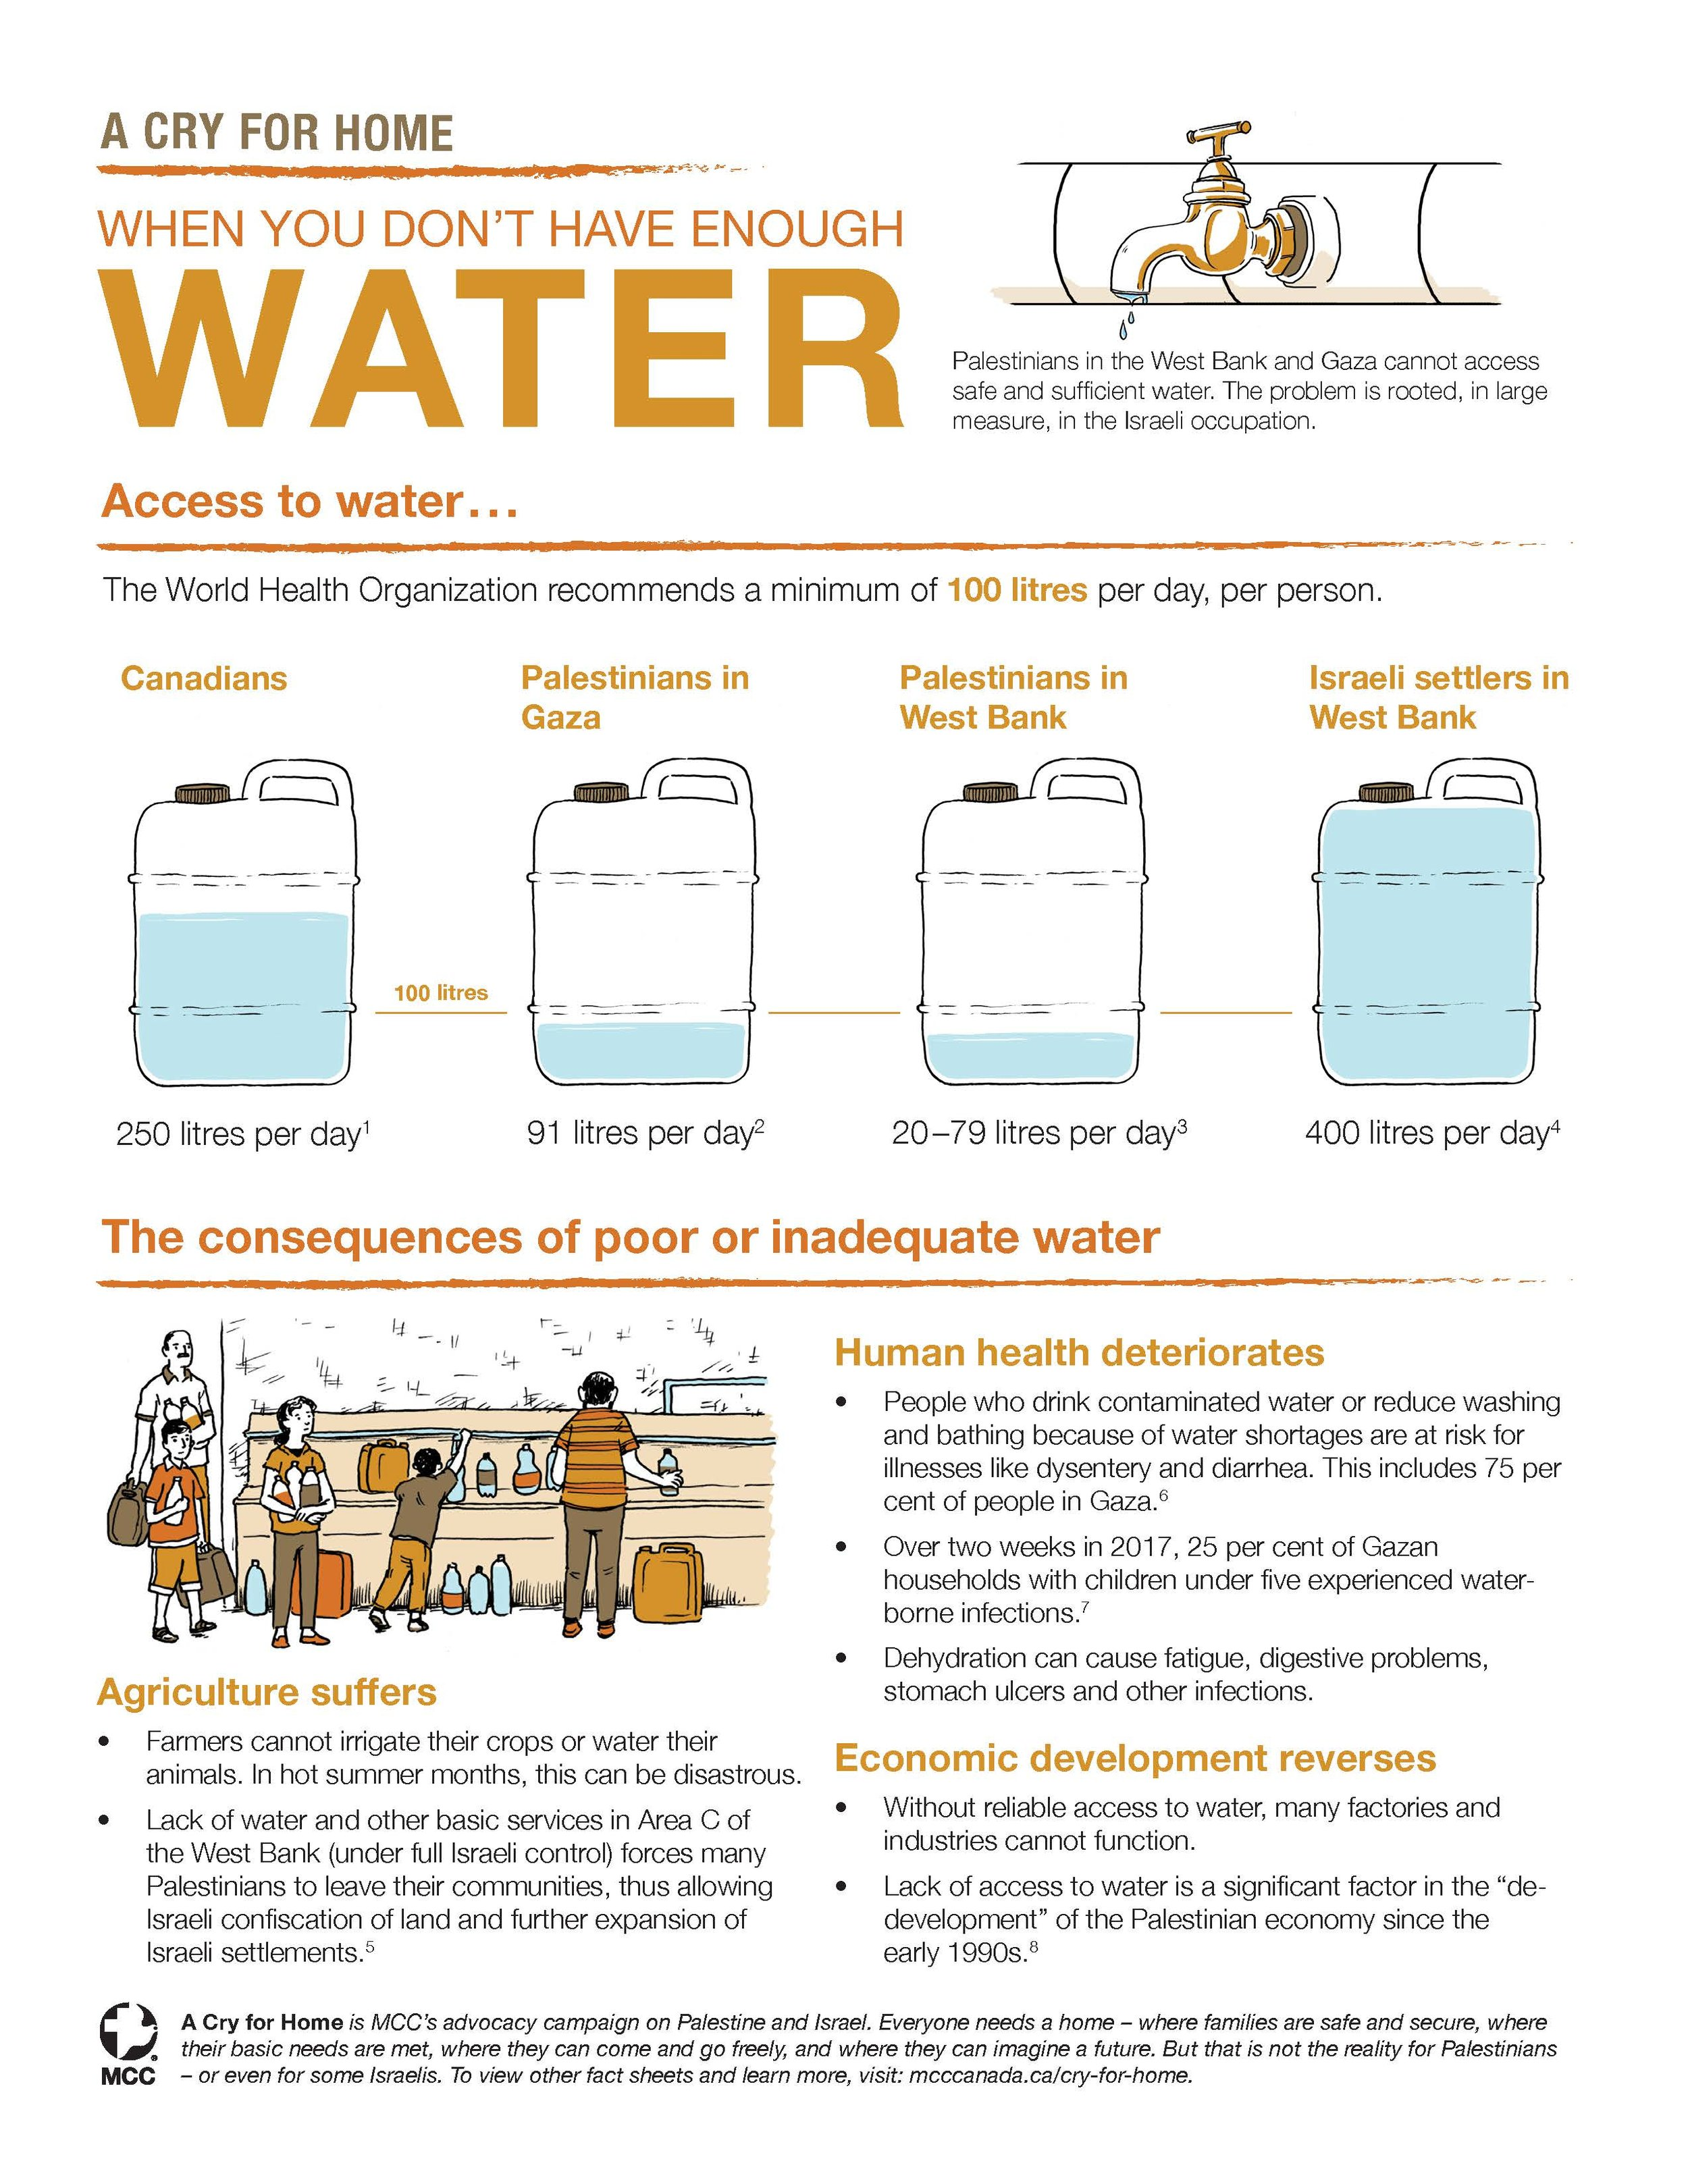 2017-09-12_acfh-fact_sheet-water_Page_1.jpg